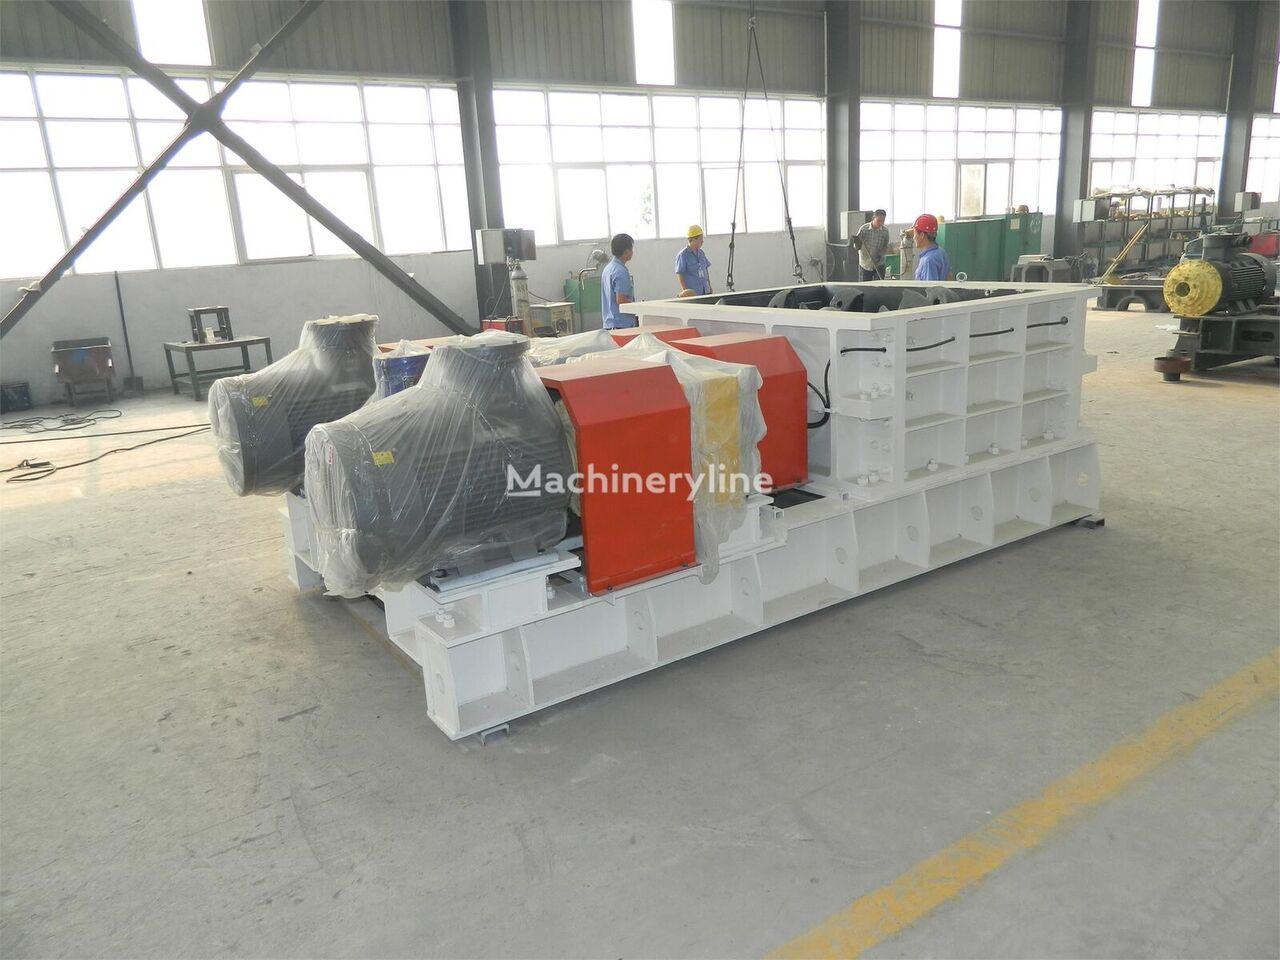 new MMD 850 Double teeth Coal Sizer Crusher crushing plant